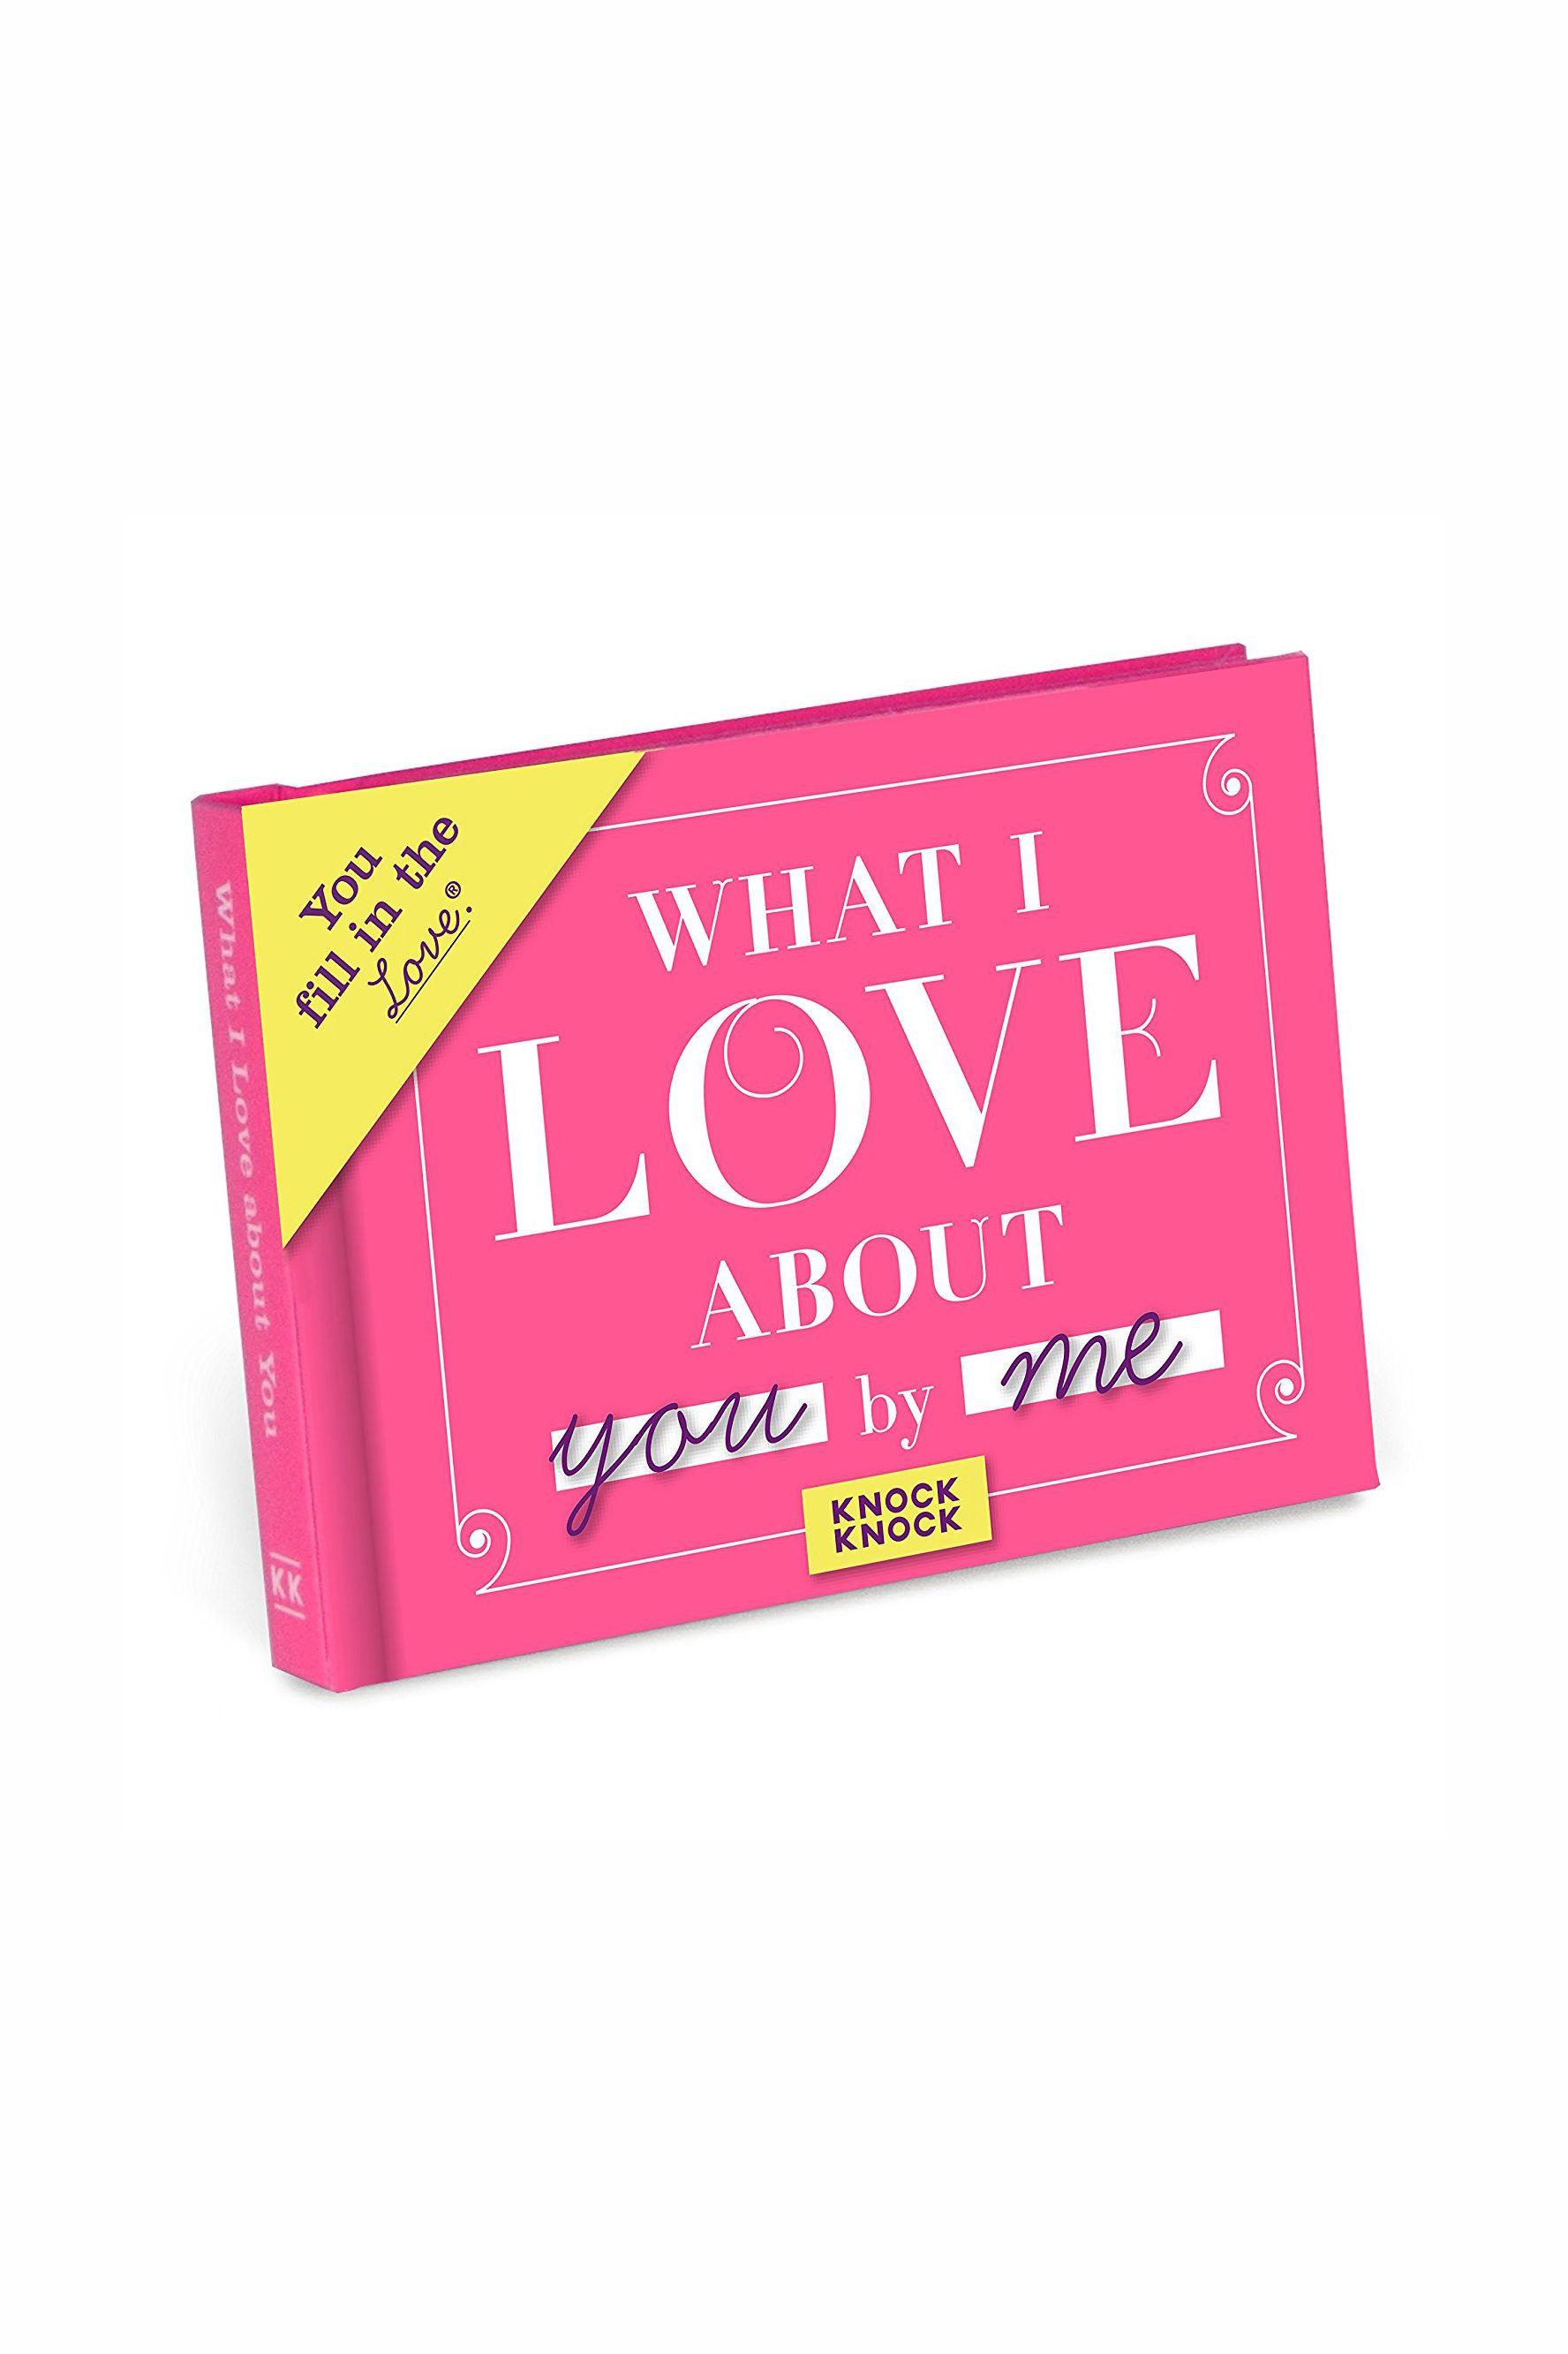 35 Best Gifts Under $20 - Cool Gift Ideas Under 20 Dollars